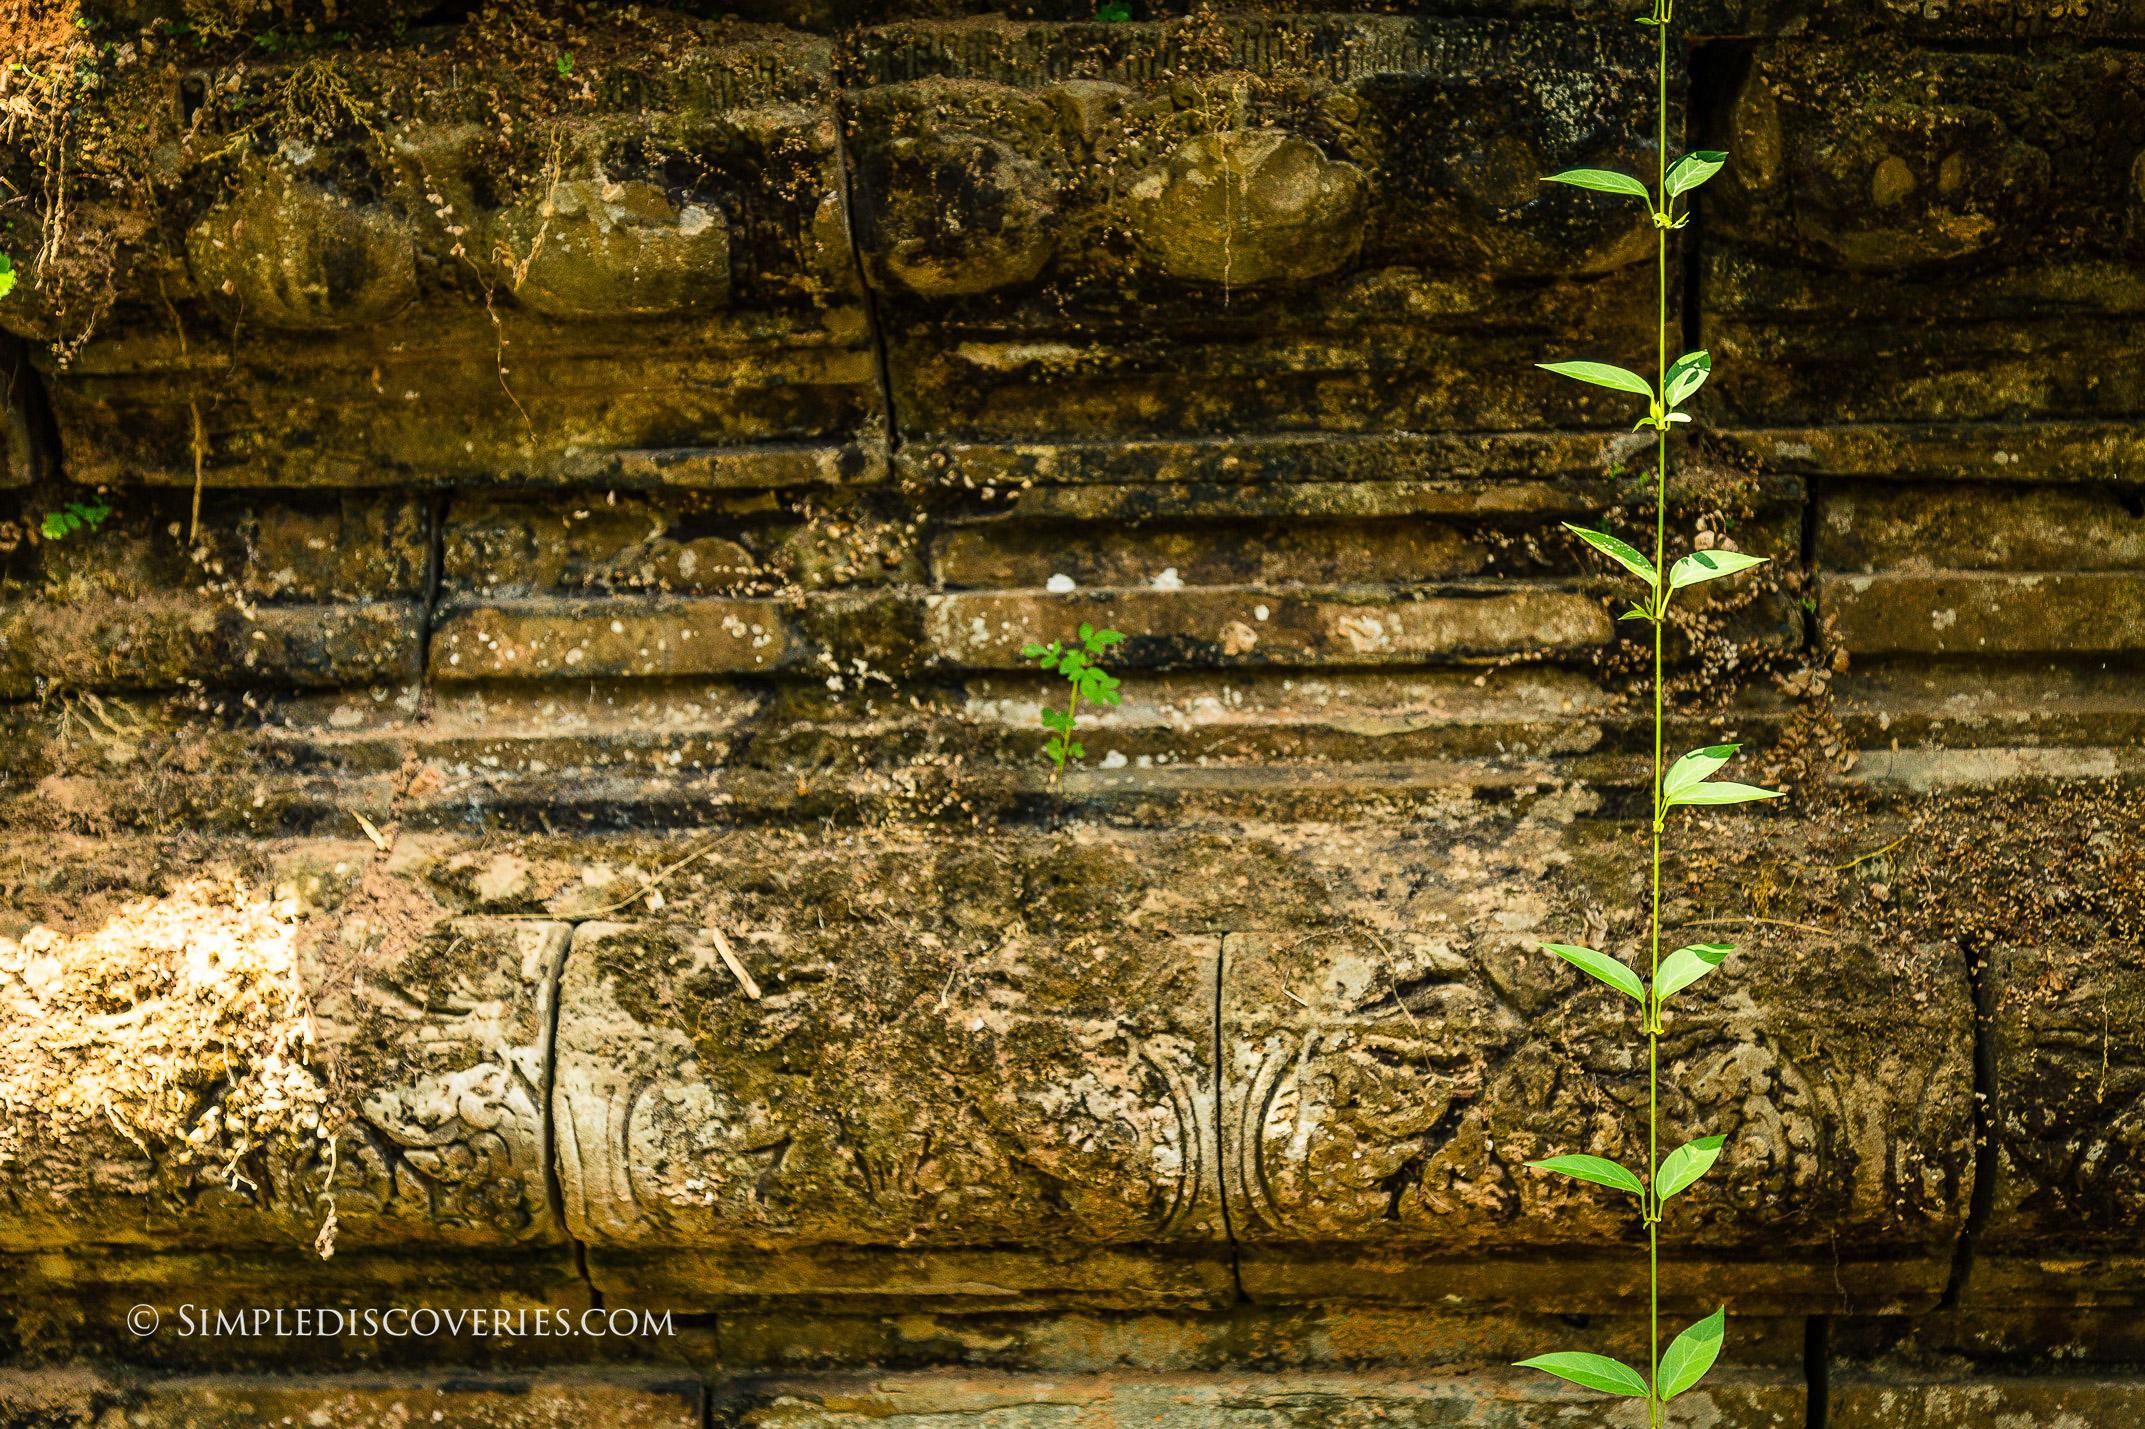 cambodia_temple_detail